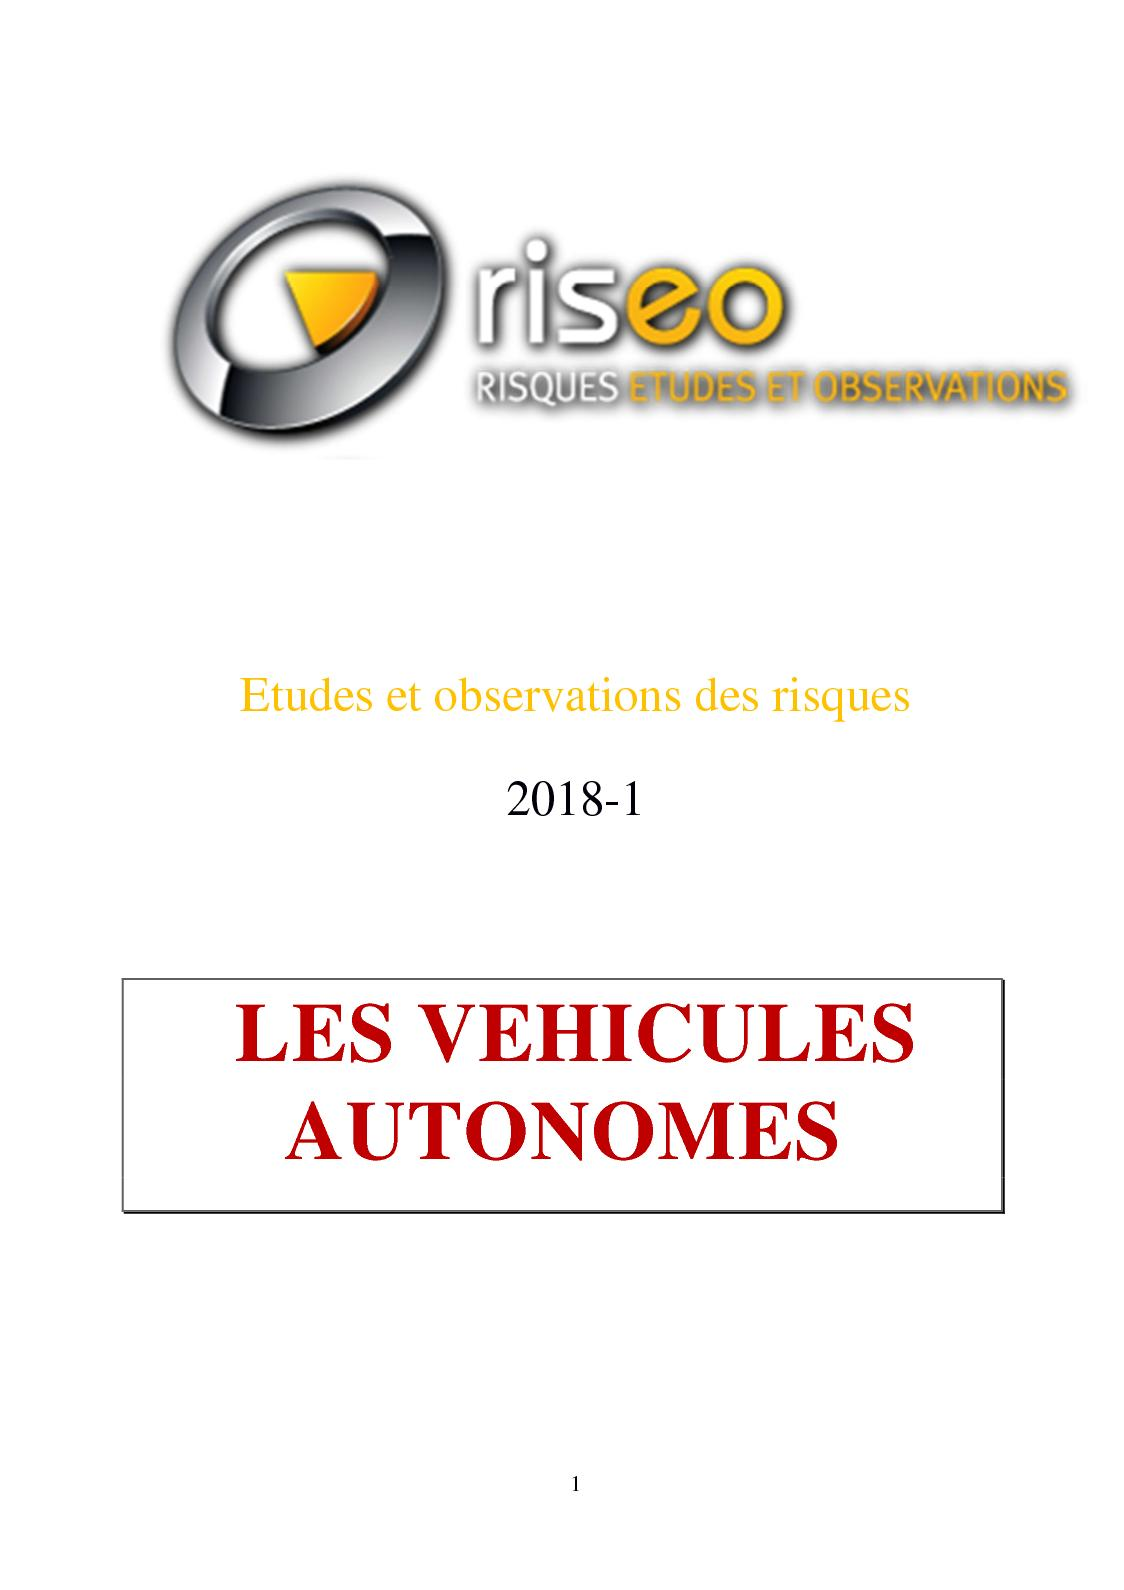 Calaméo - Riseo 2018 1 Les véhicules autonomes b632a01b89a